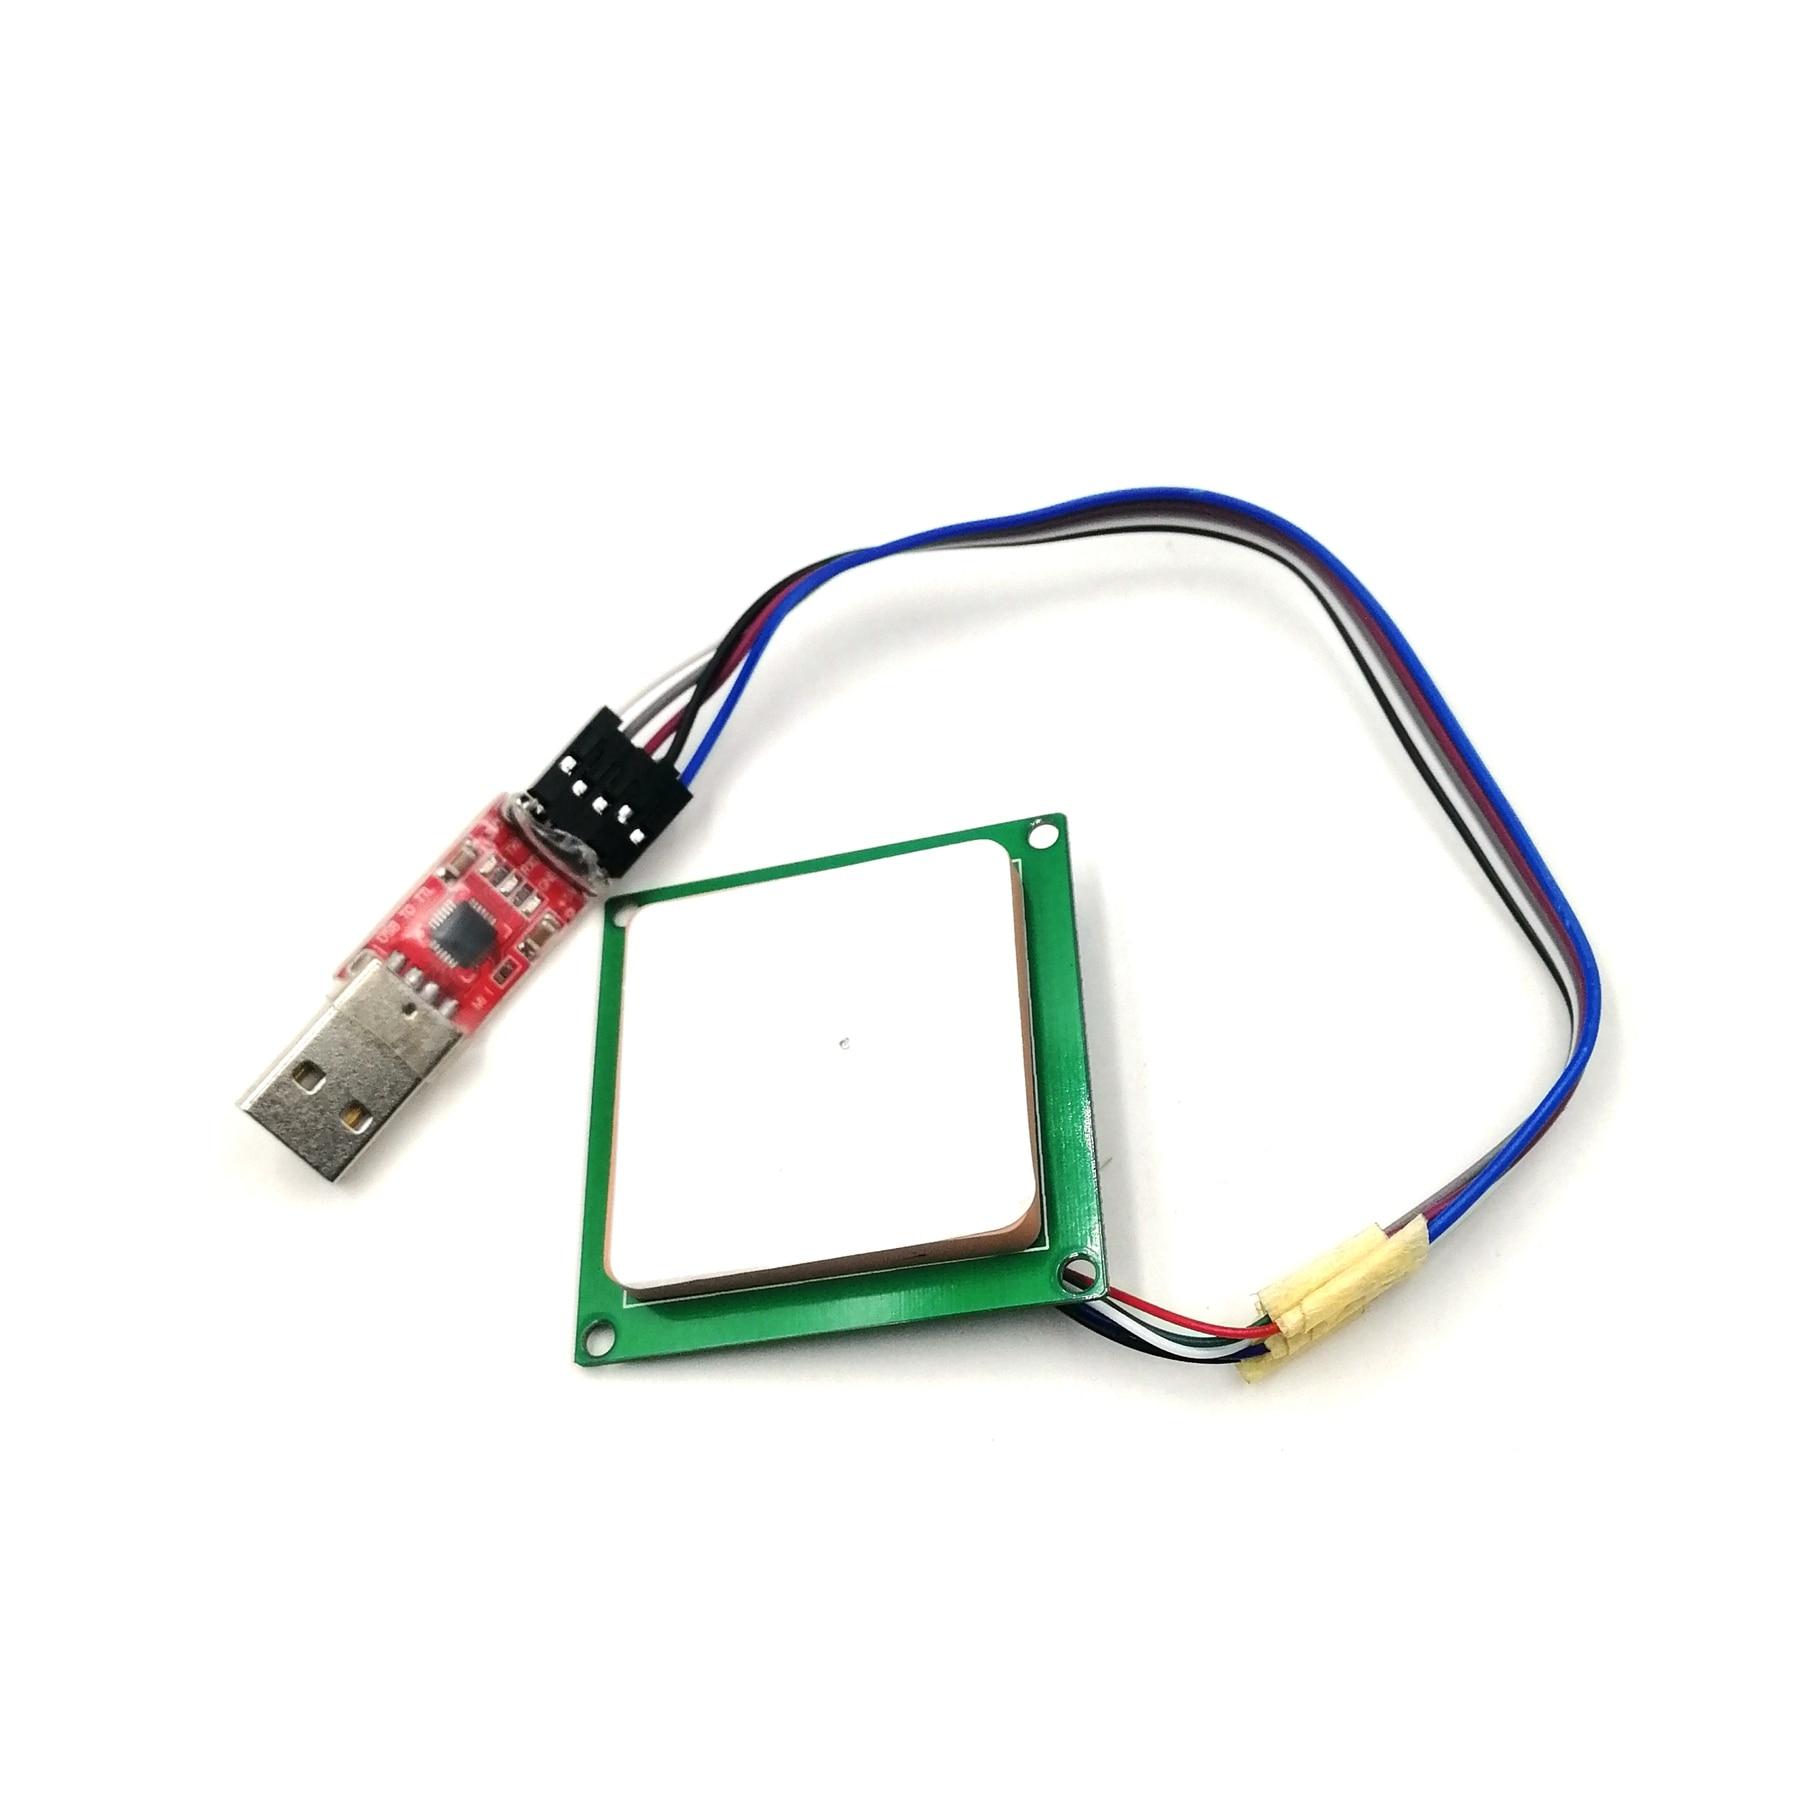 0-3M Long Range UHF Integrated Reader Writer Module 865-868MHz 915mhz 902-928MHz Uart Passive 6C UHF With SDK